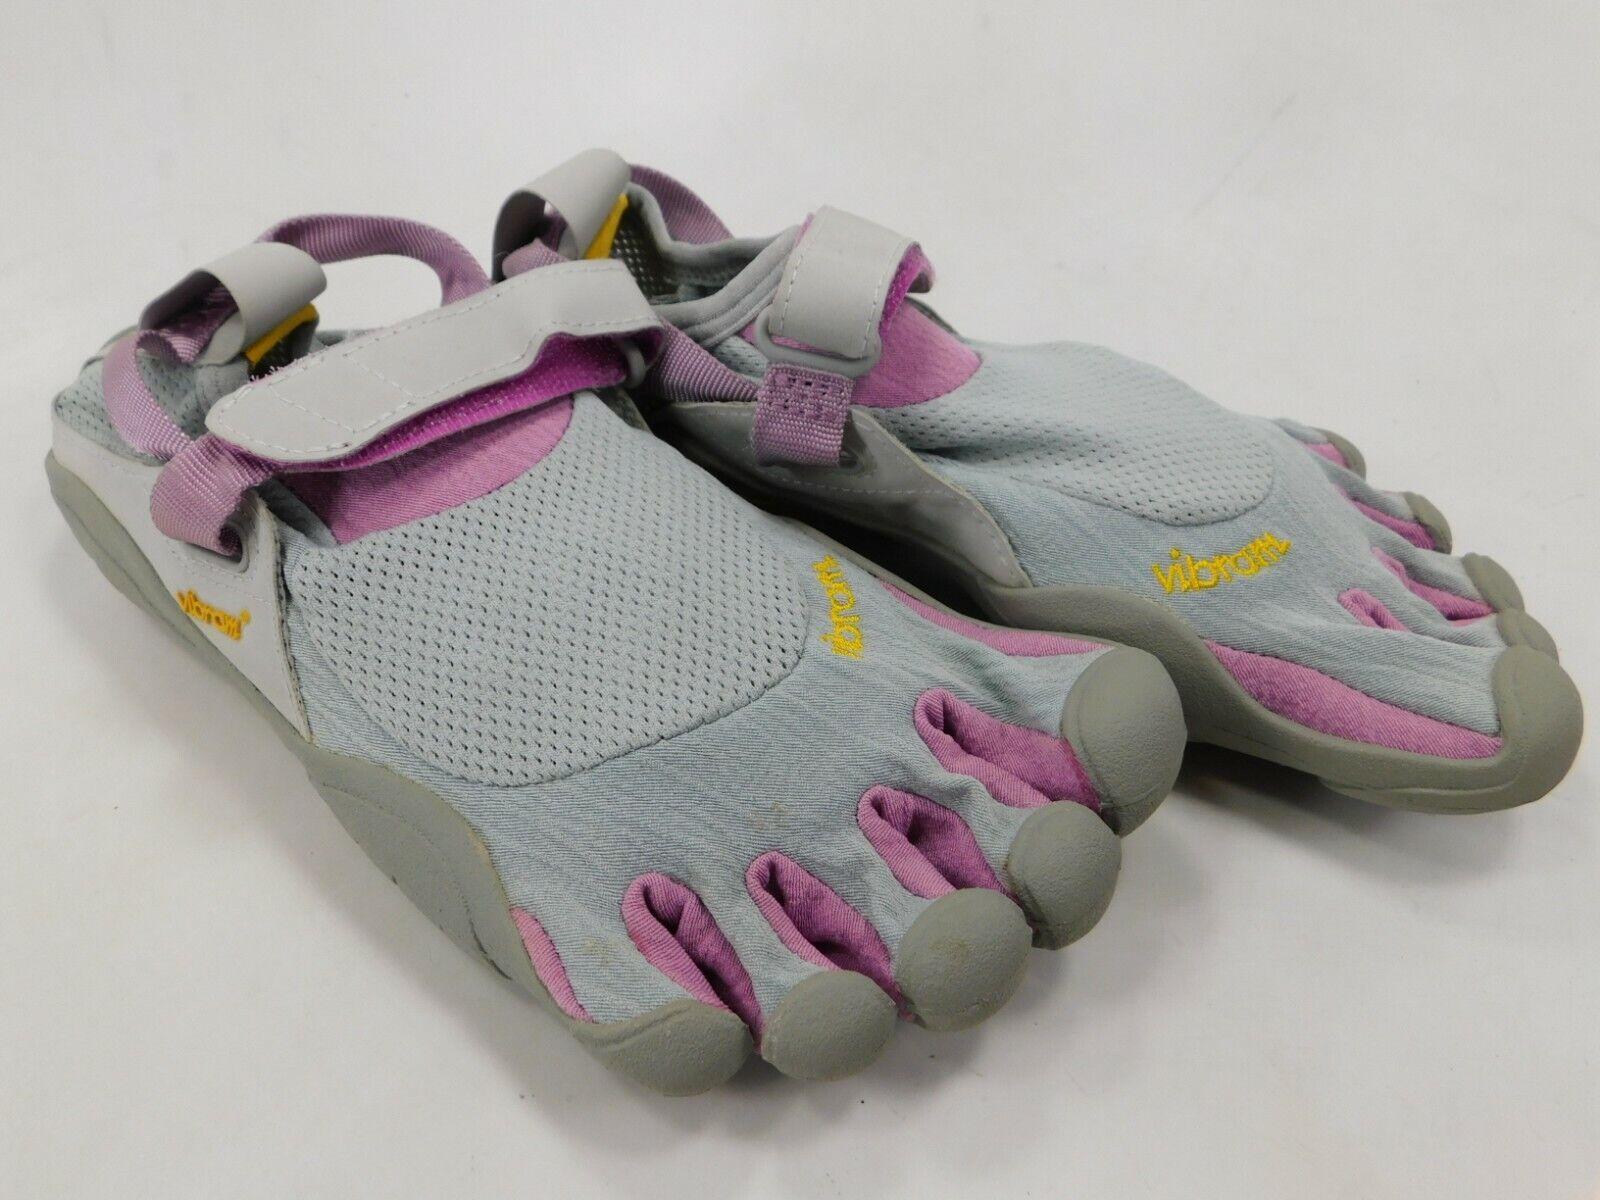 Vibram Fivefingers Kso (Us 7-7.5) Mujer Zapatillas para Correr gris